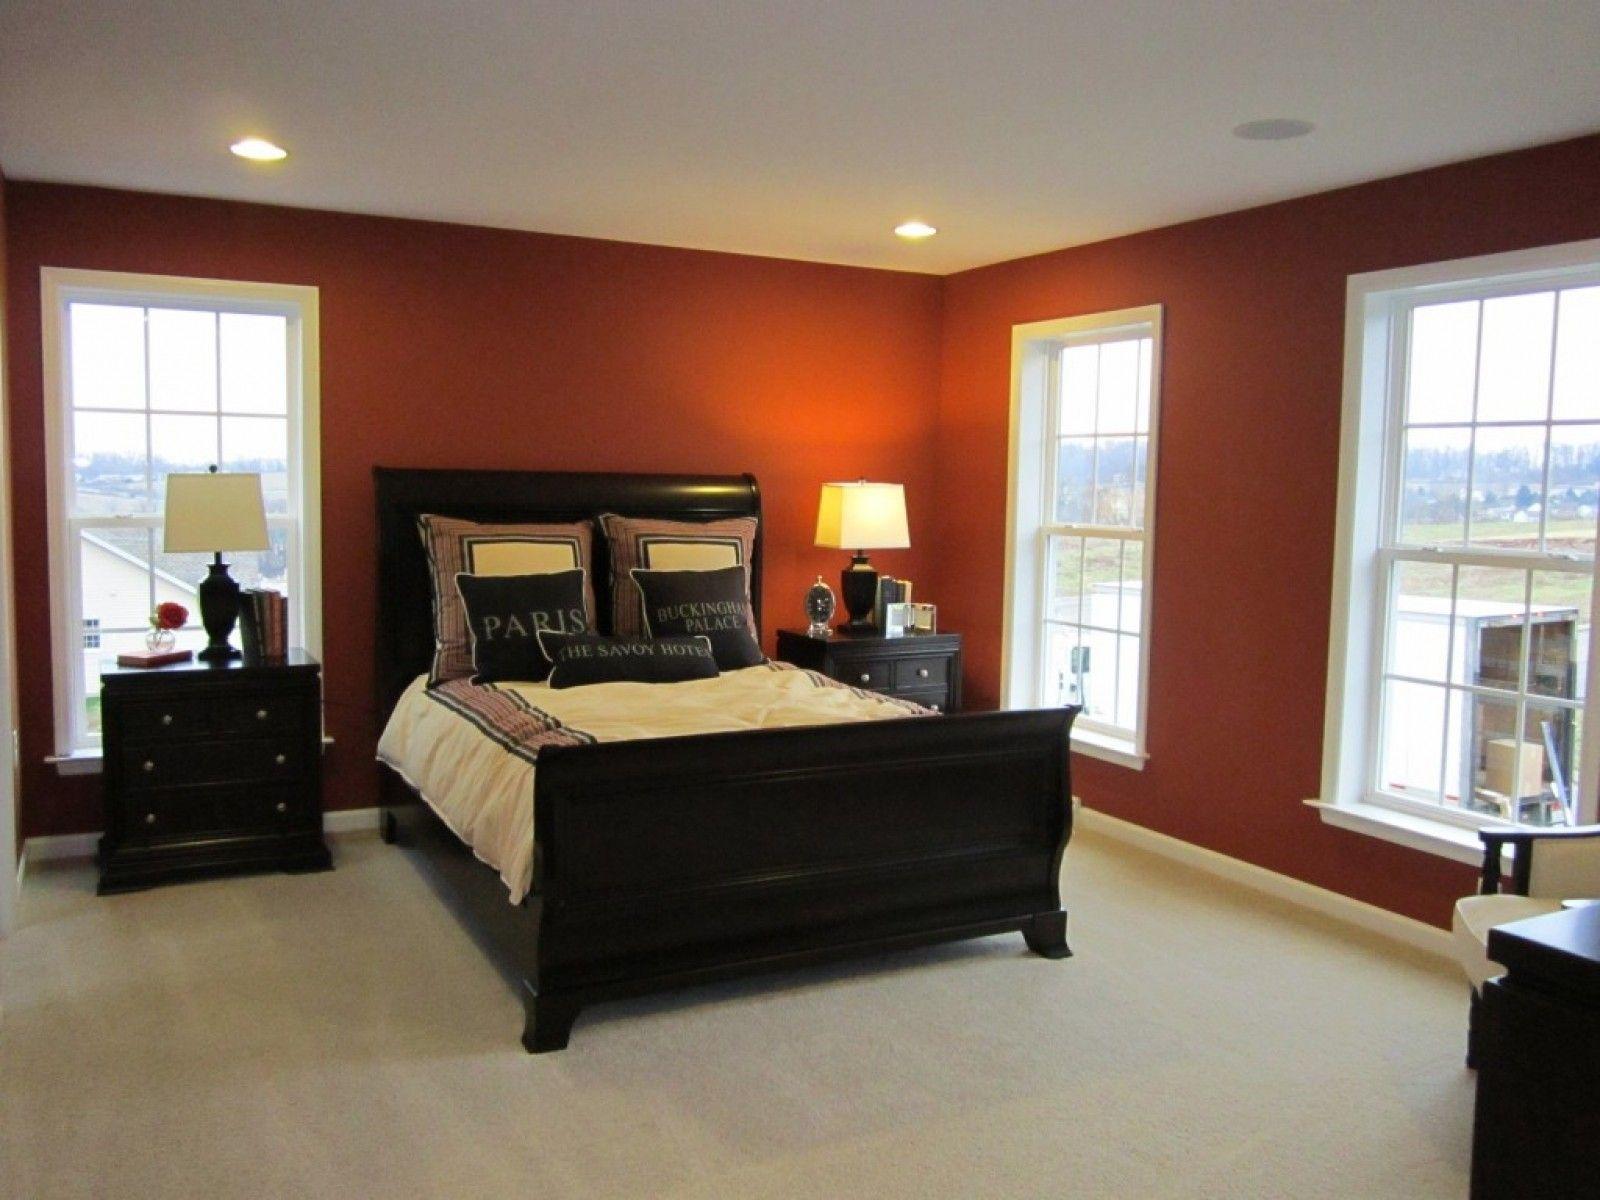 bedroom recessed lighting ideas | design ideas 2017-2018